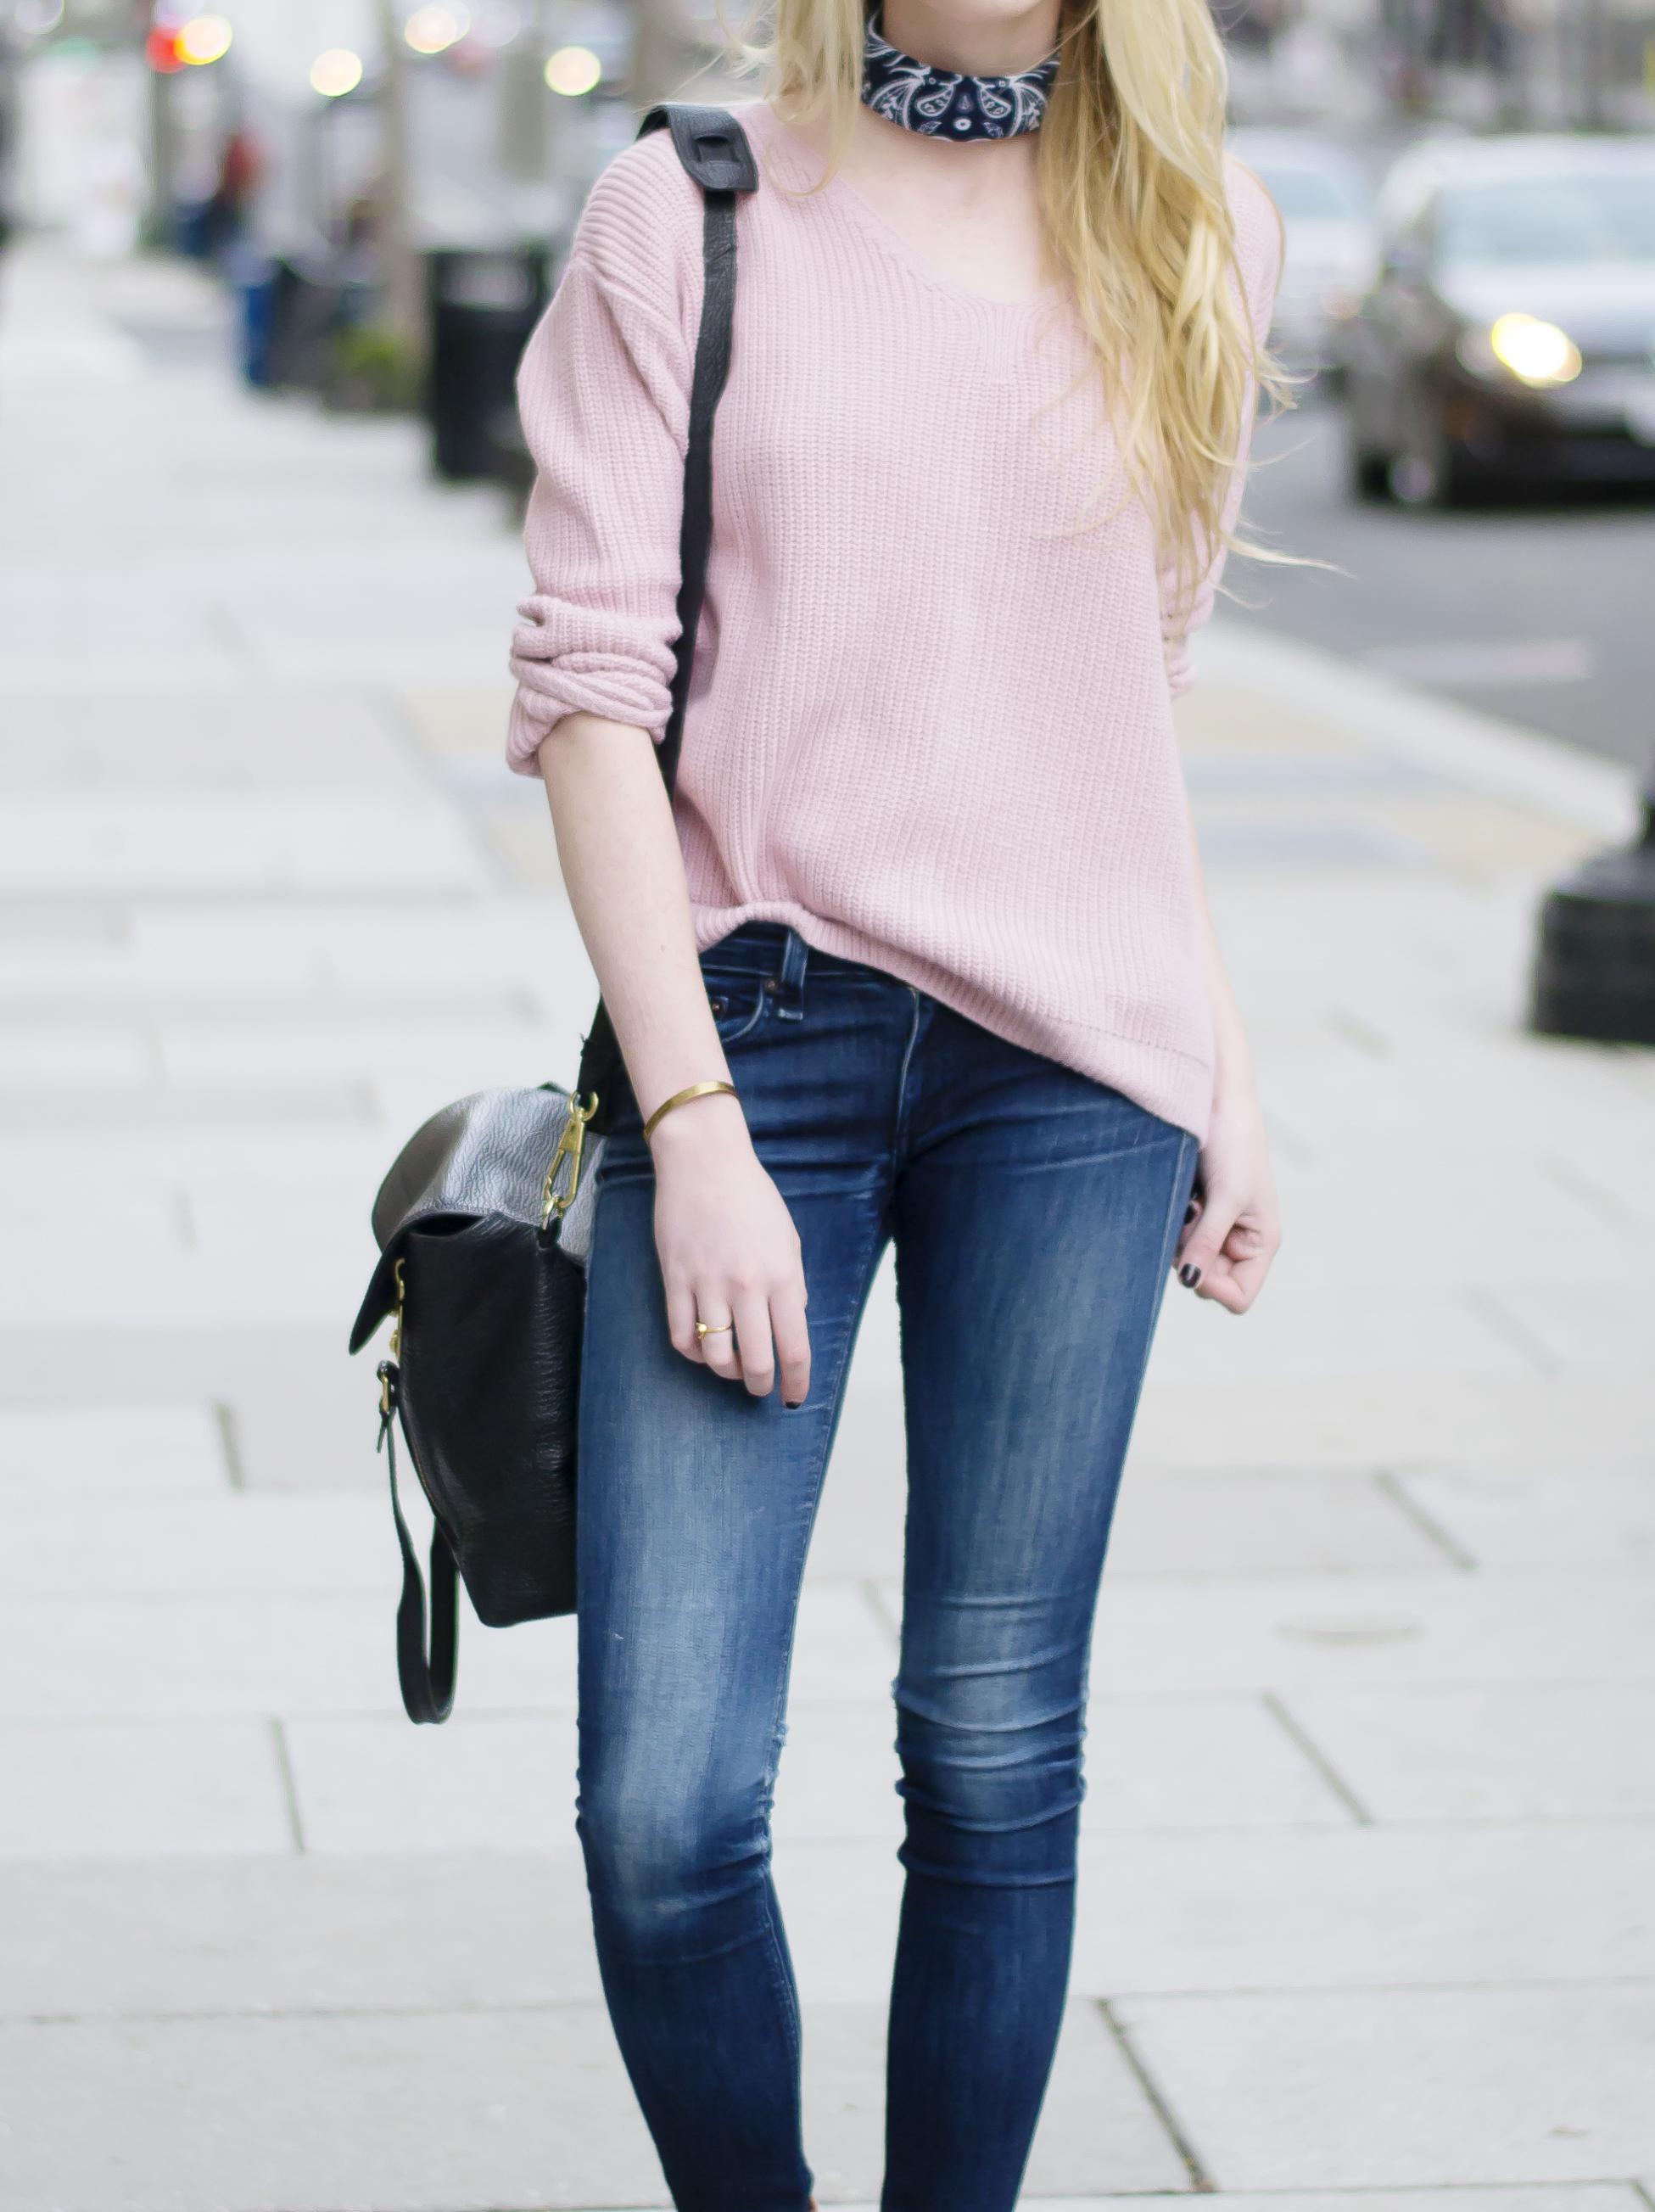 Blogger Winter Style